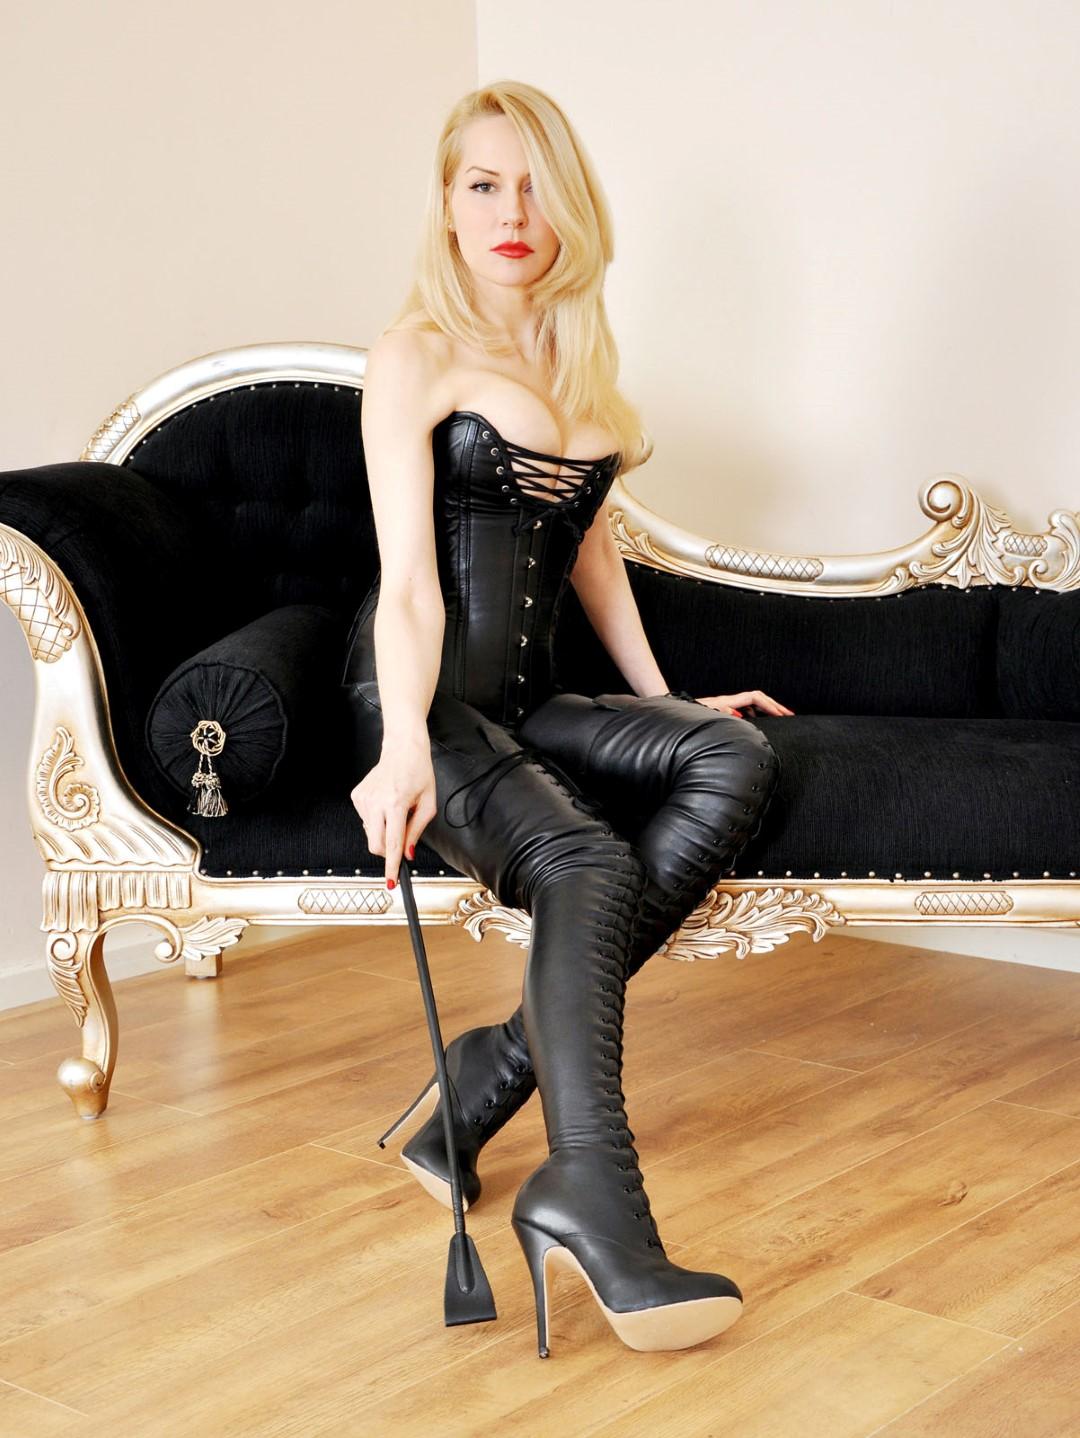 Mistress Eleise GALLERY